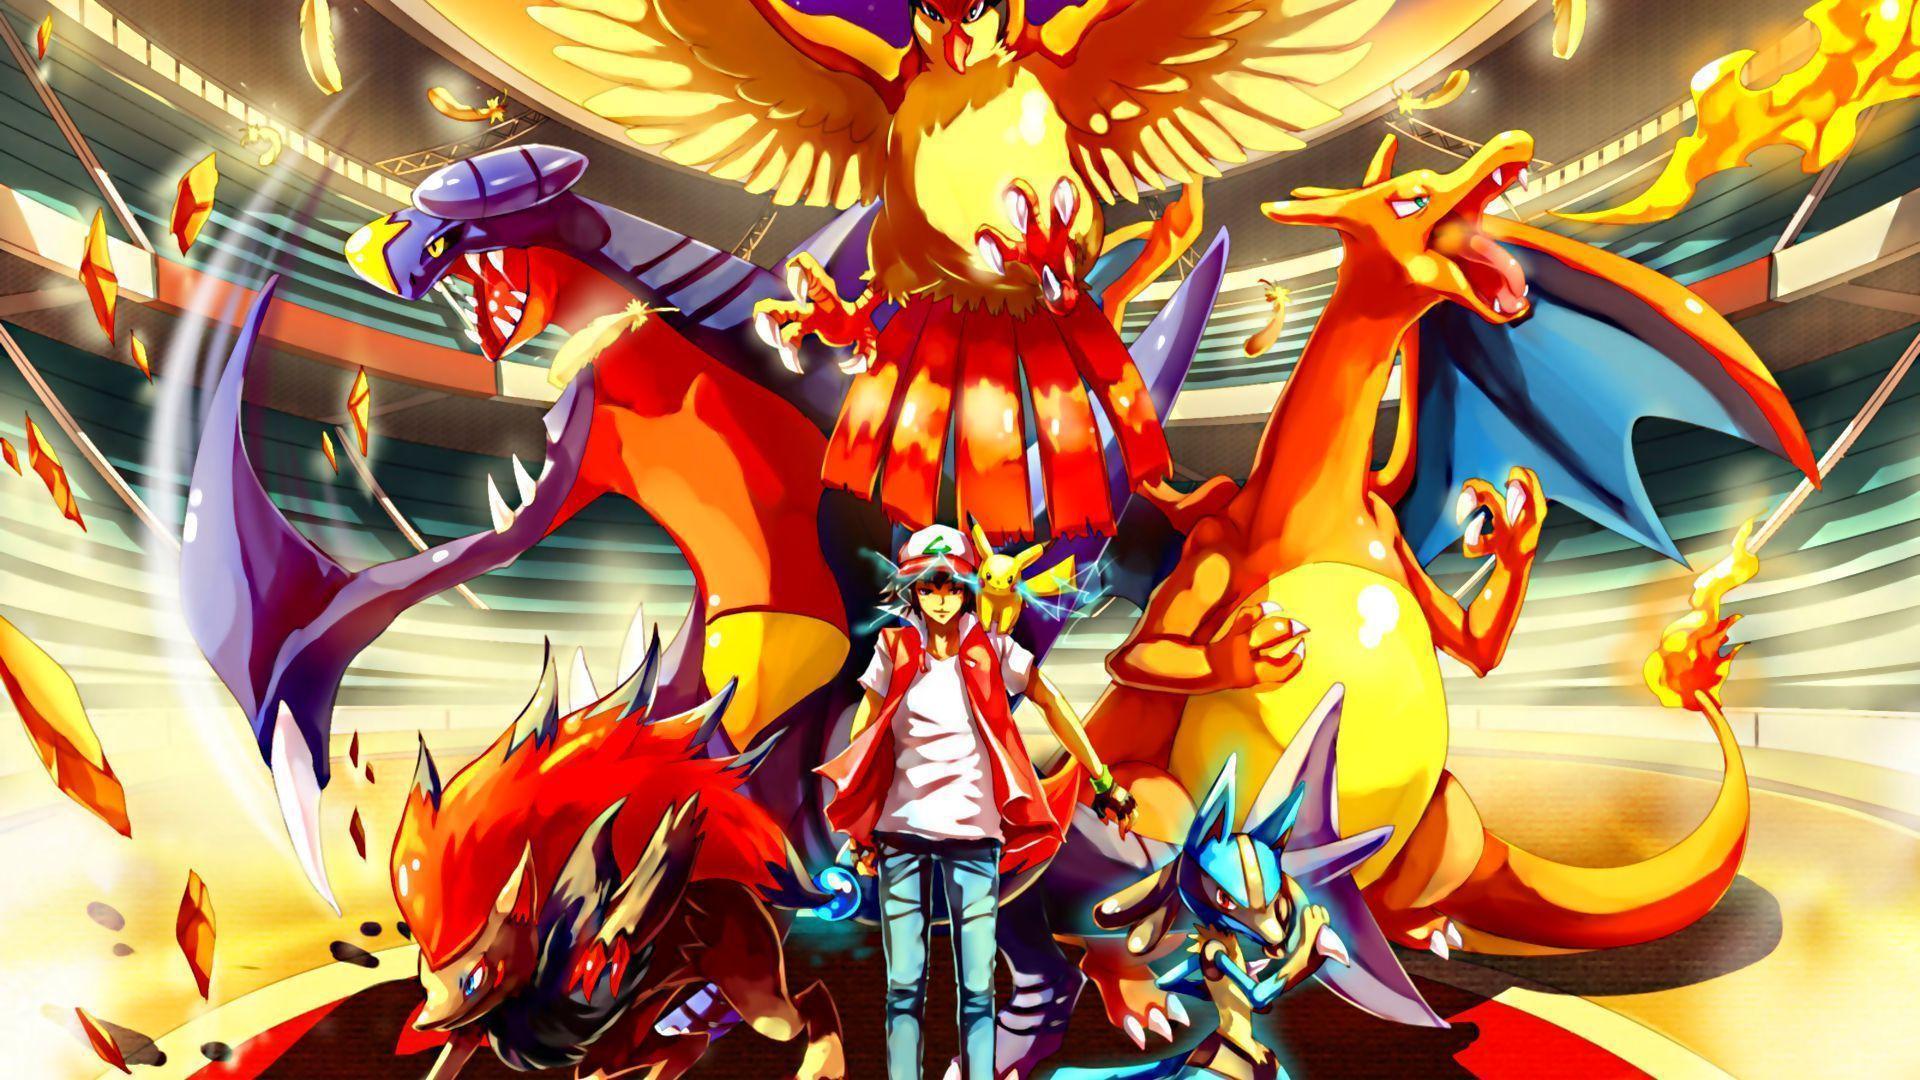 Cool Pokemon Backgrounds 1920x1080